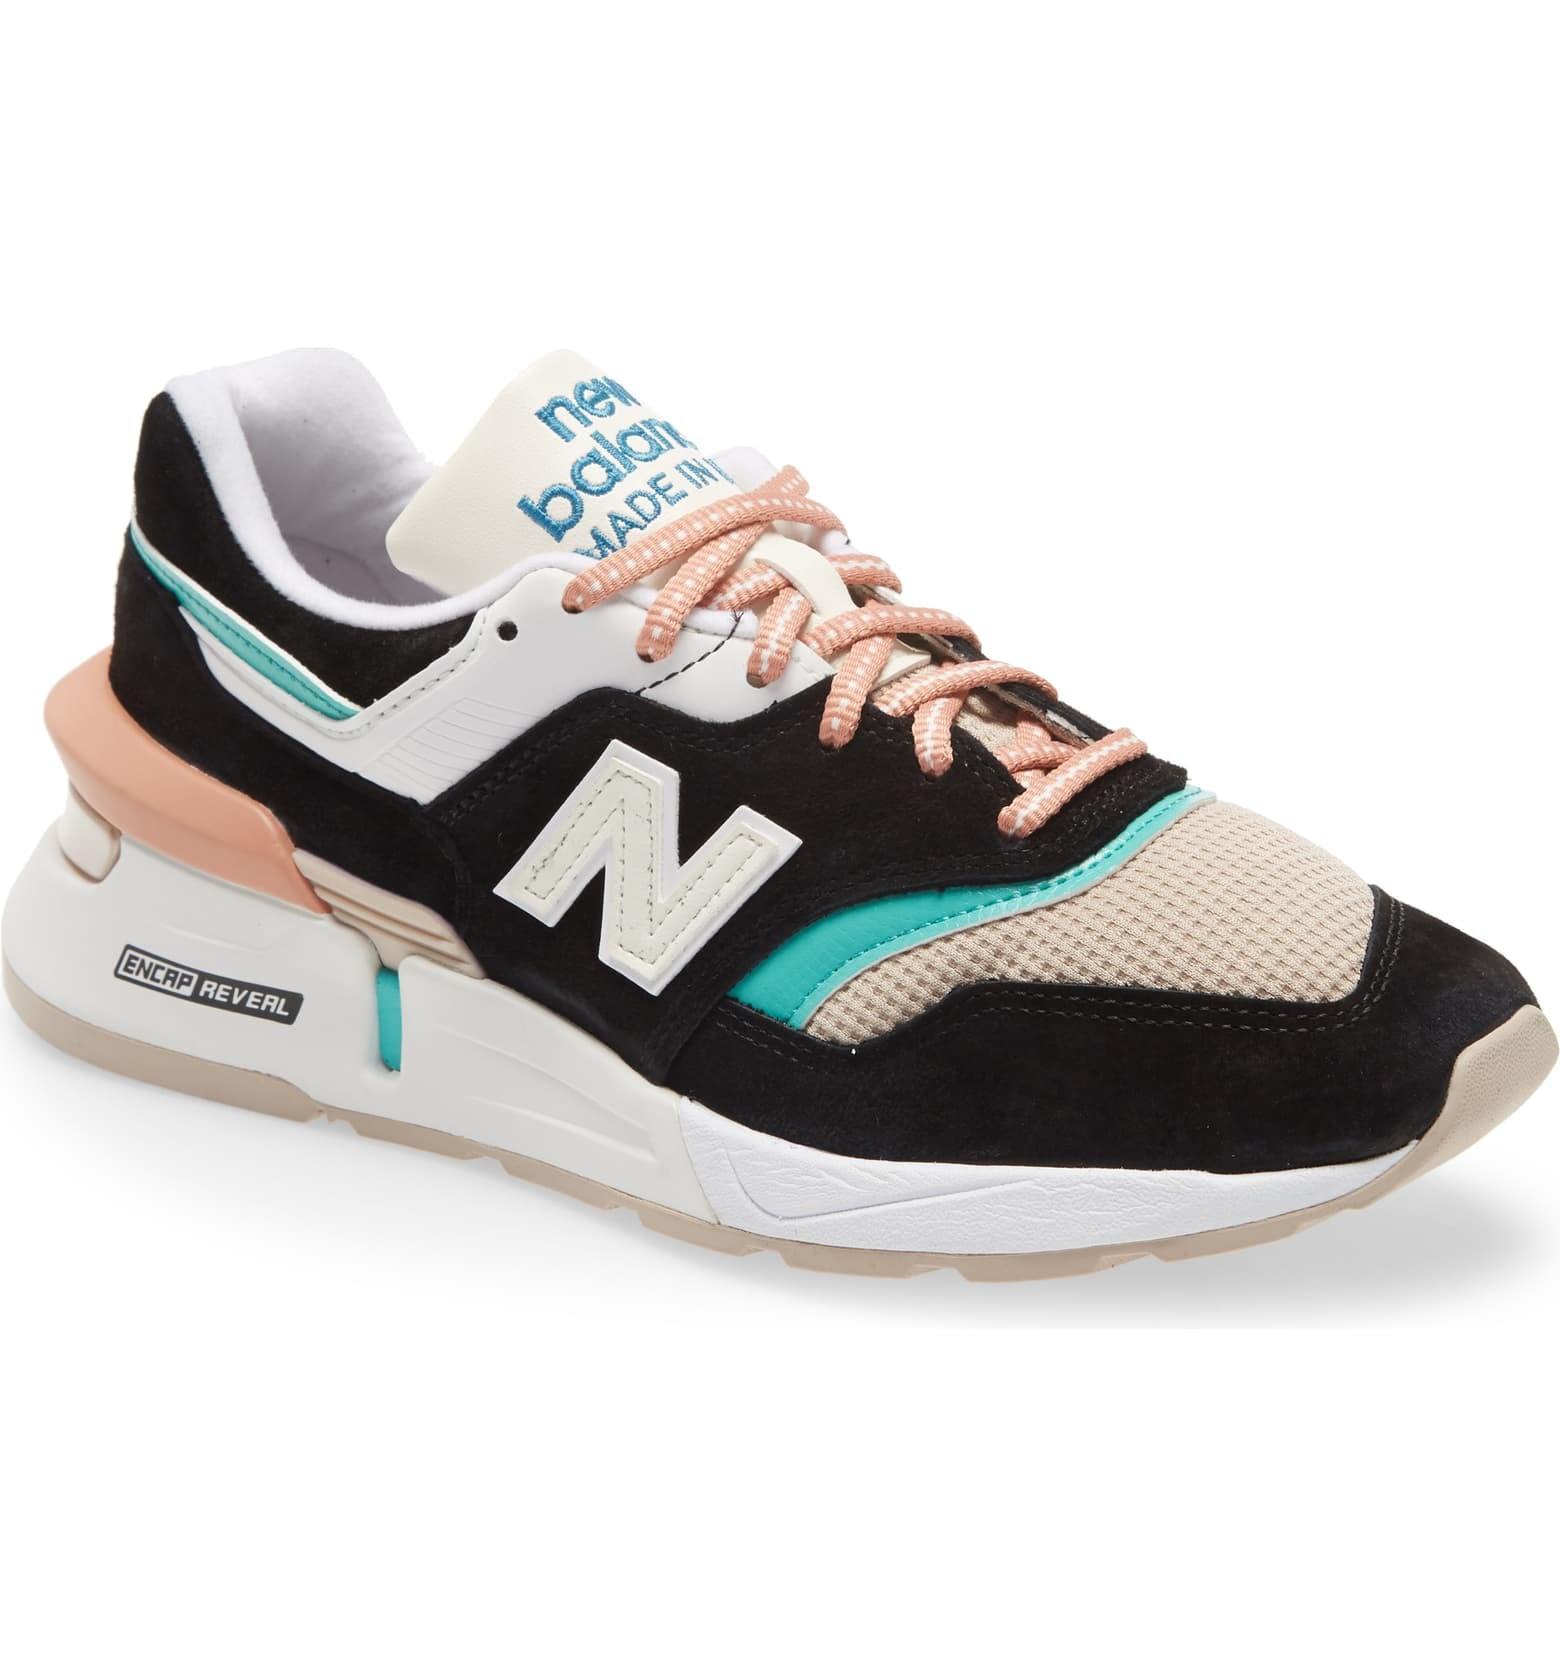 finalizando confiar Notorio  The Best New Balance Sneakers For Women | POPSUGAR Fashion